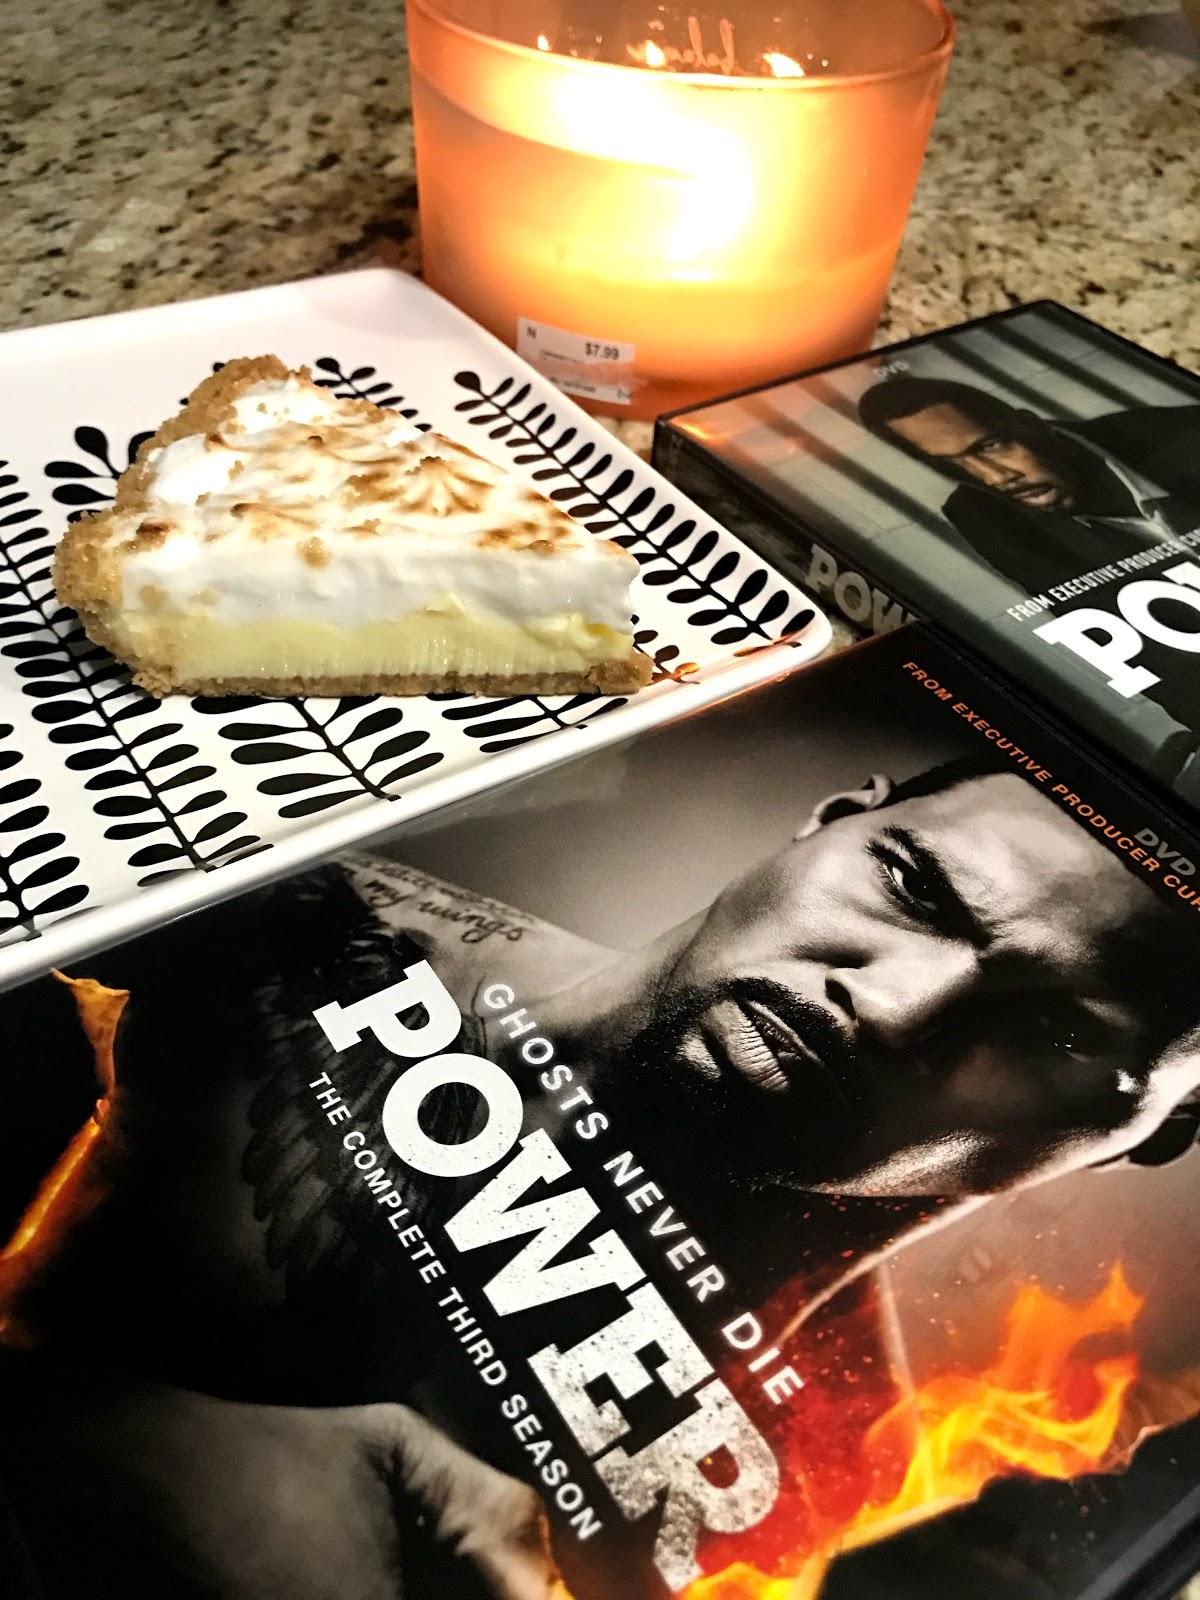 Image:Lemon  Pie and Power movie on table